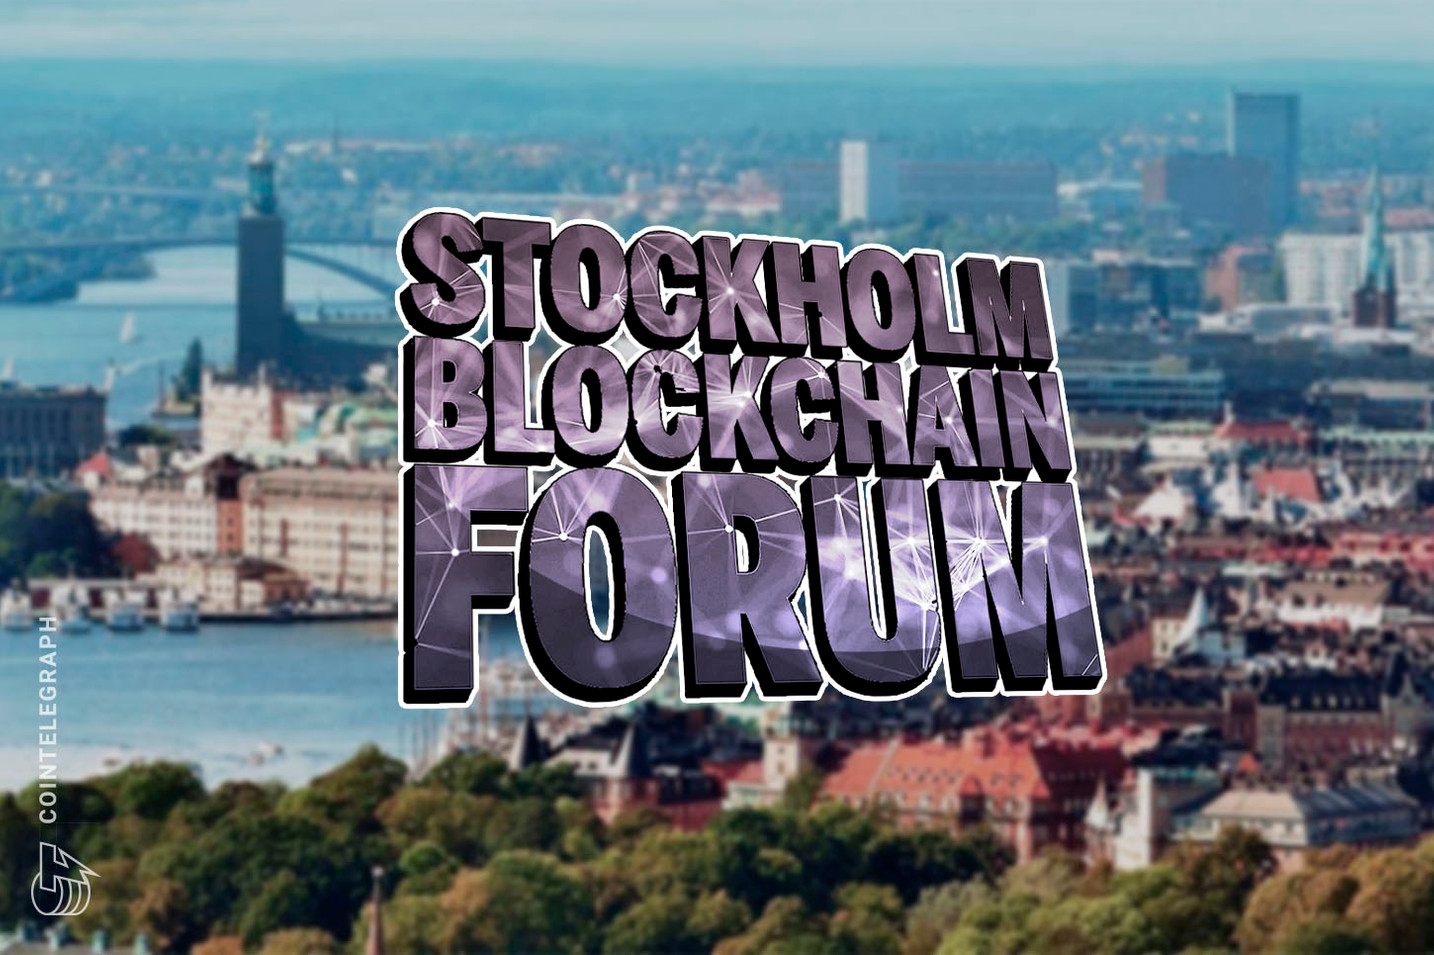 Stockholm Blockchain Forum Announce Stellar Show in April